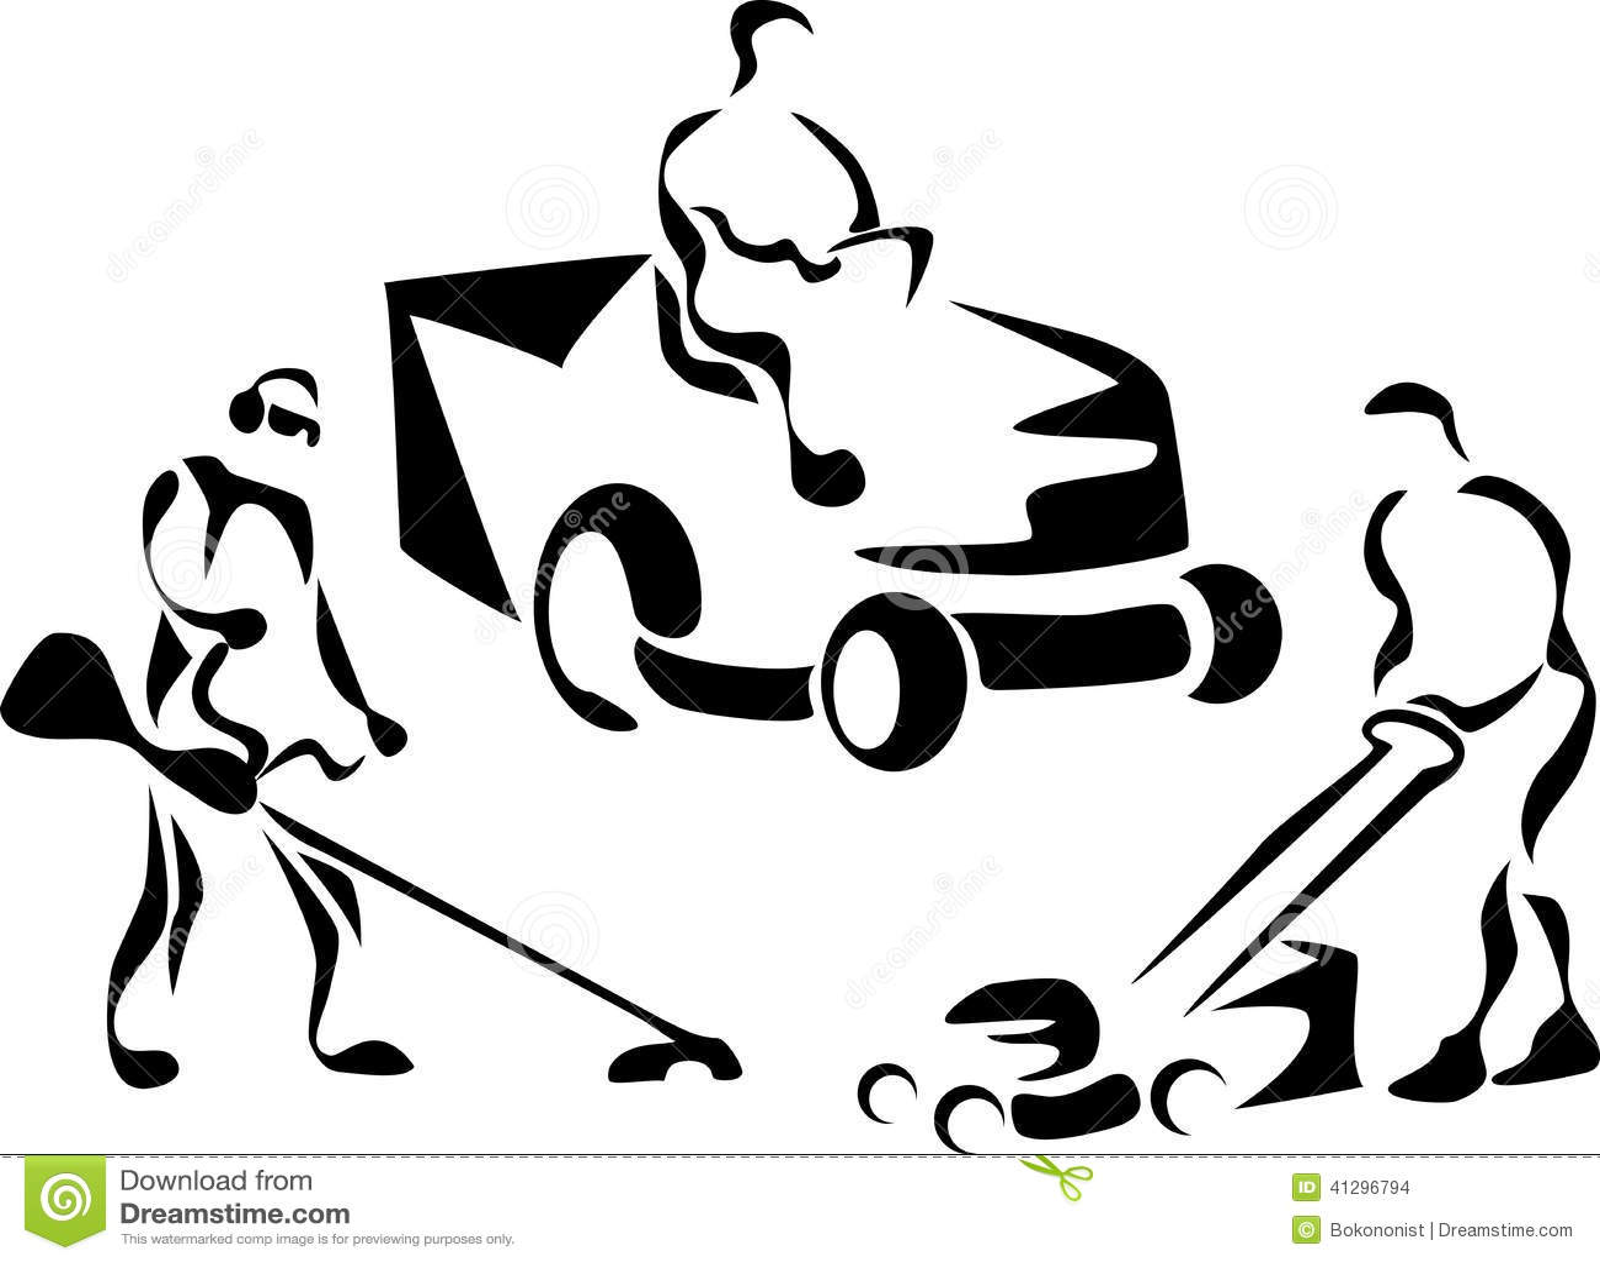 Lawnmower Stock Vector Image 41296794